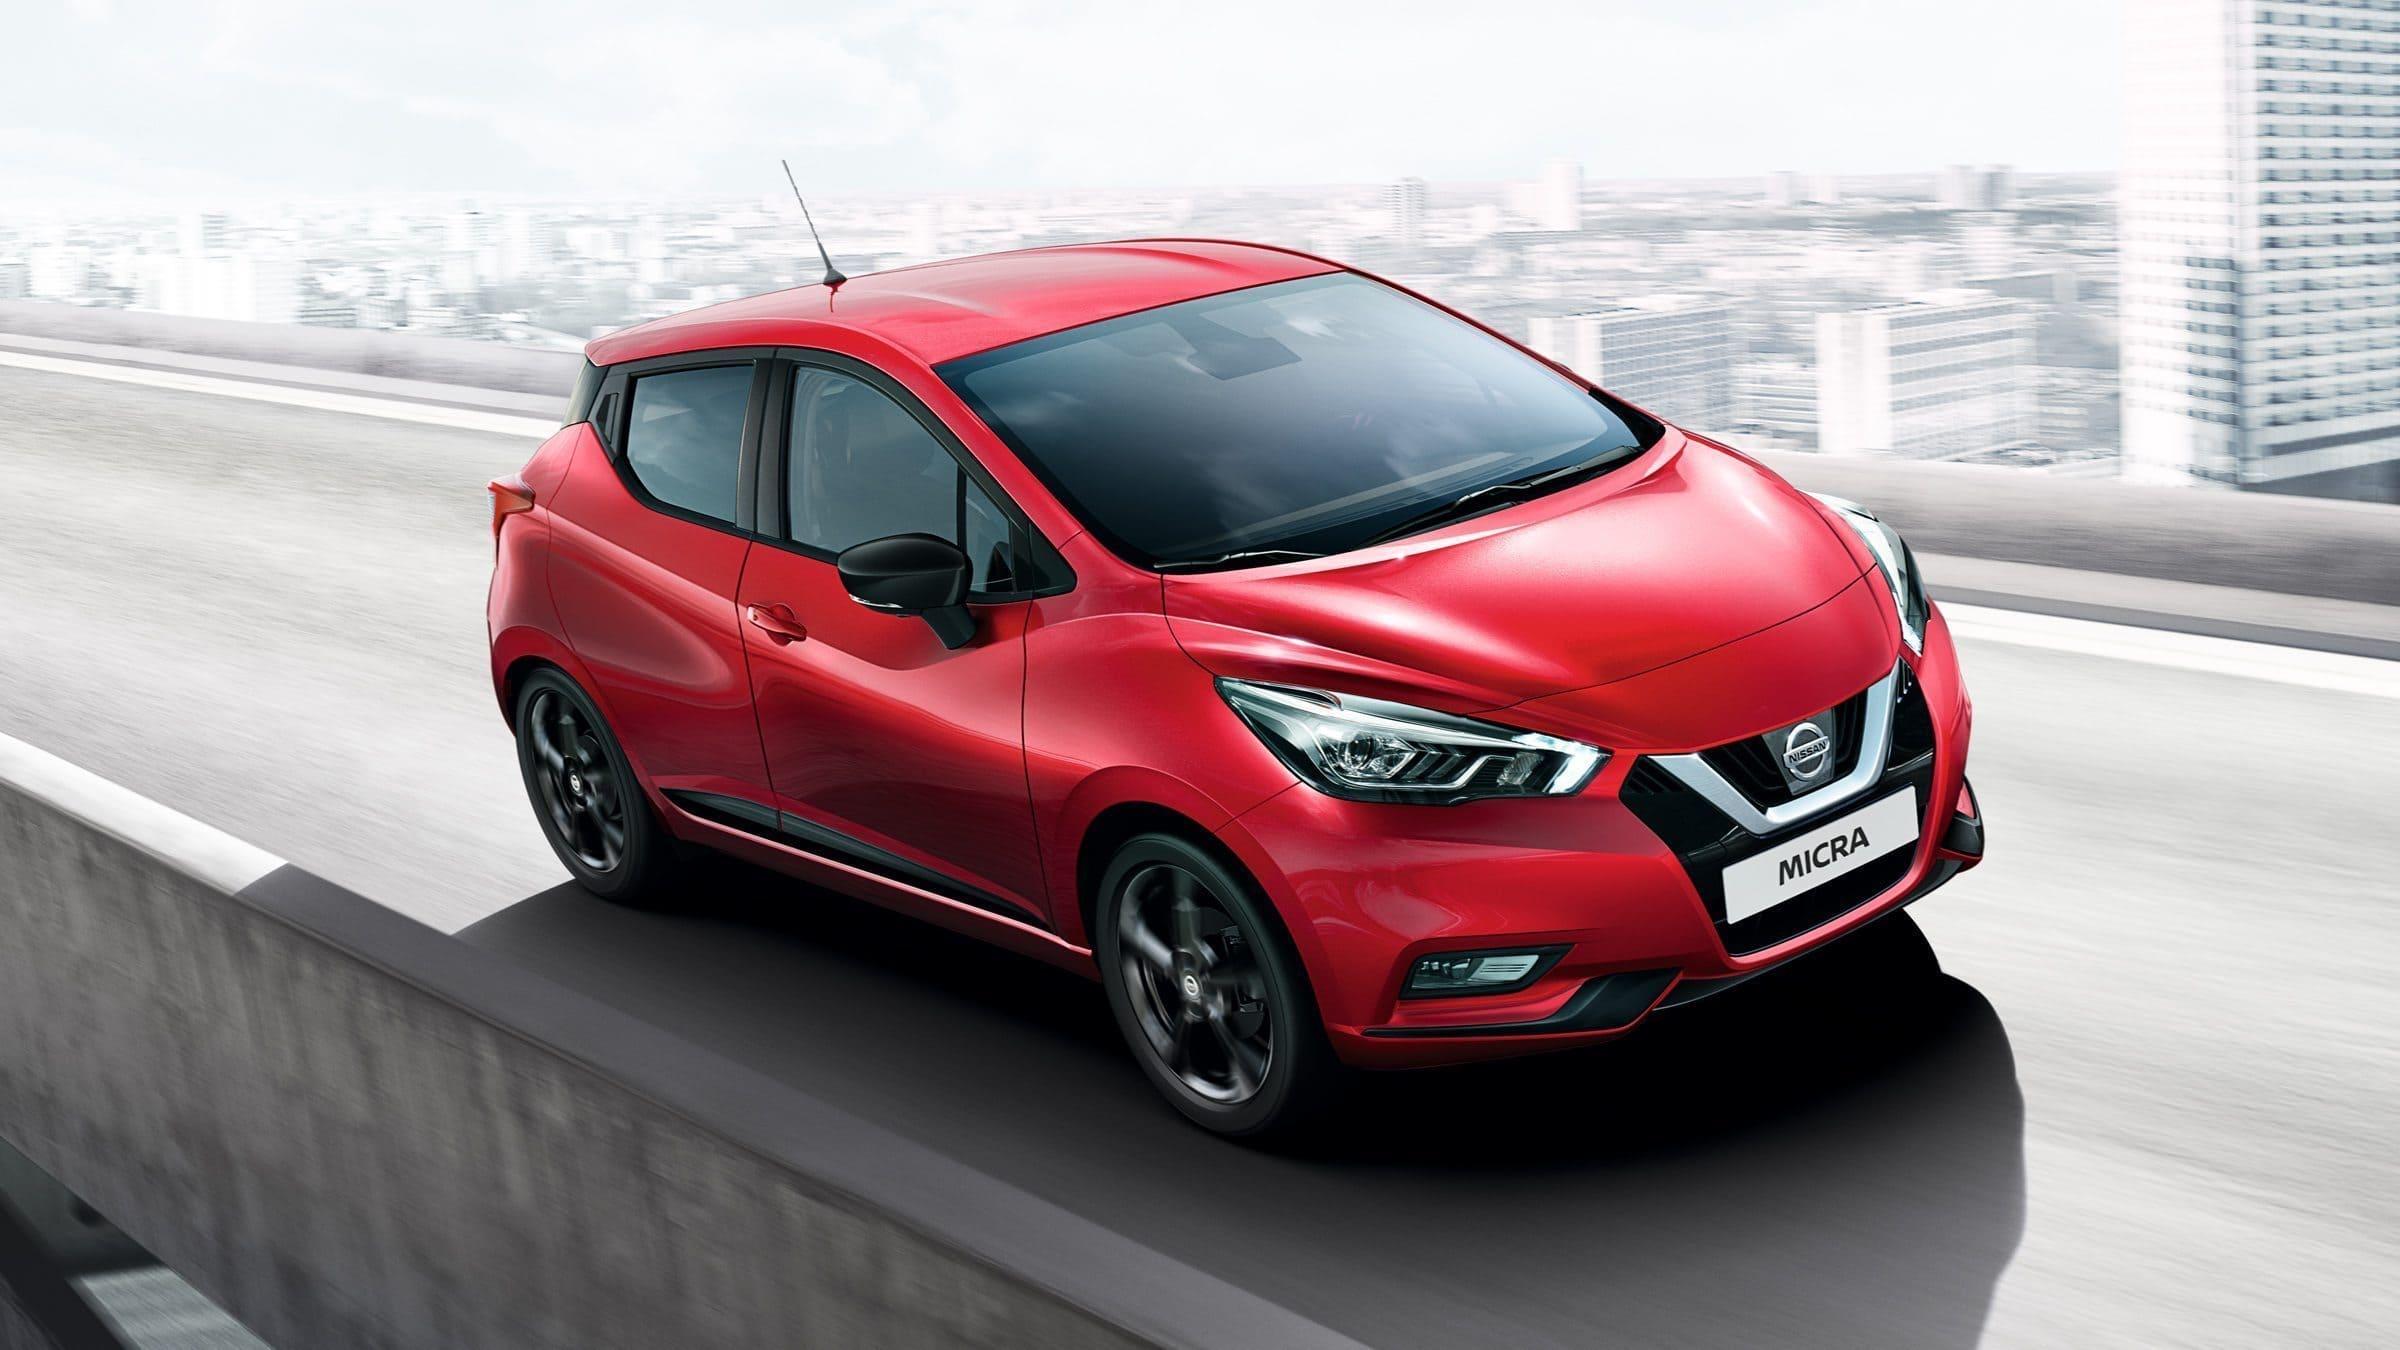 Nissan-Micra-Rood